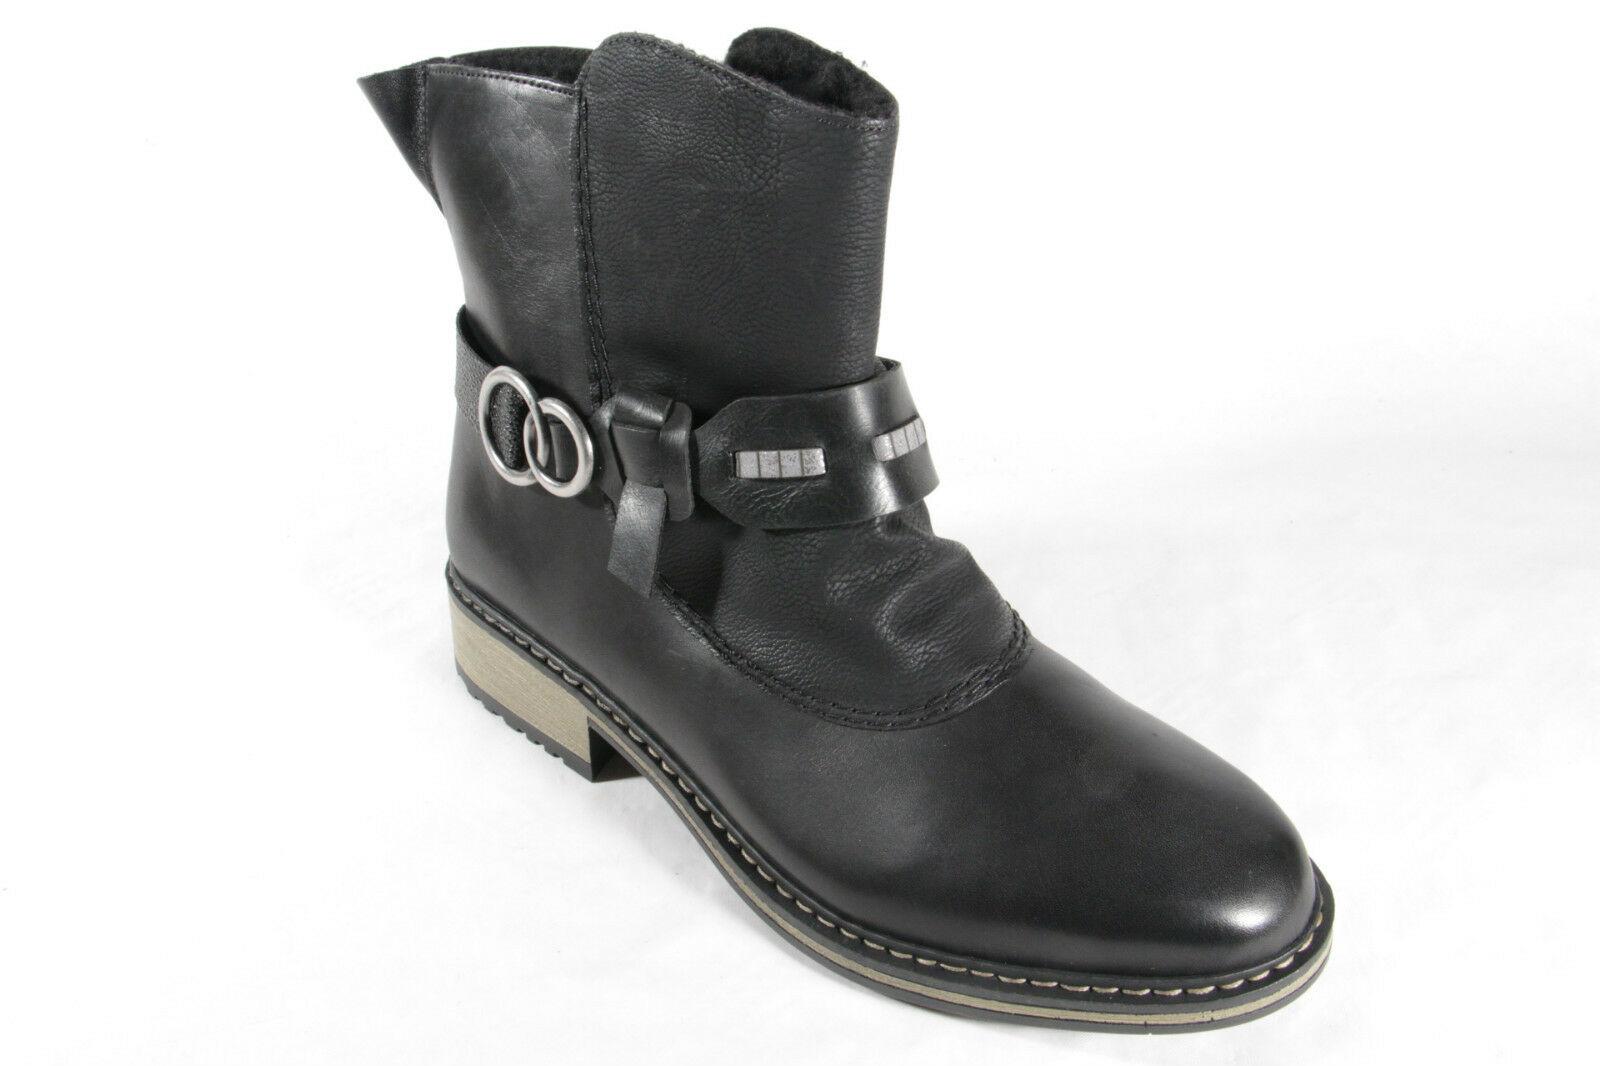 Rieker Damen Stiefel Stiefeletten Boots Winterstiefel schwarzZ6899  NEU